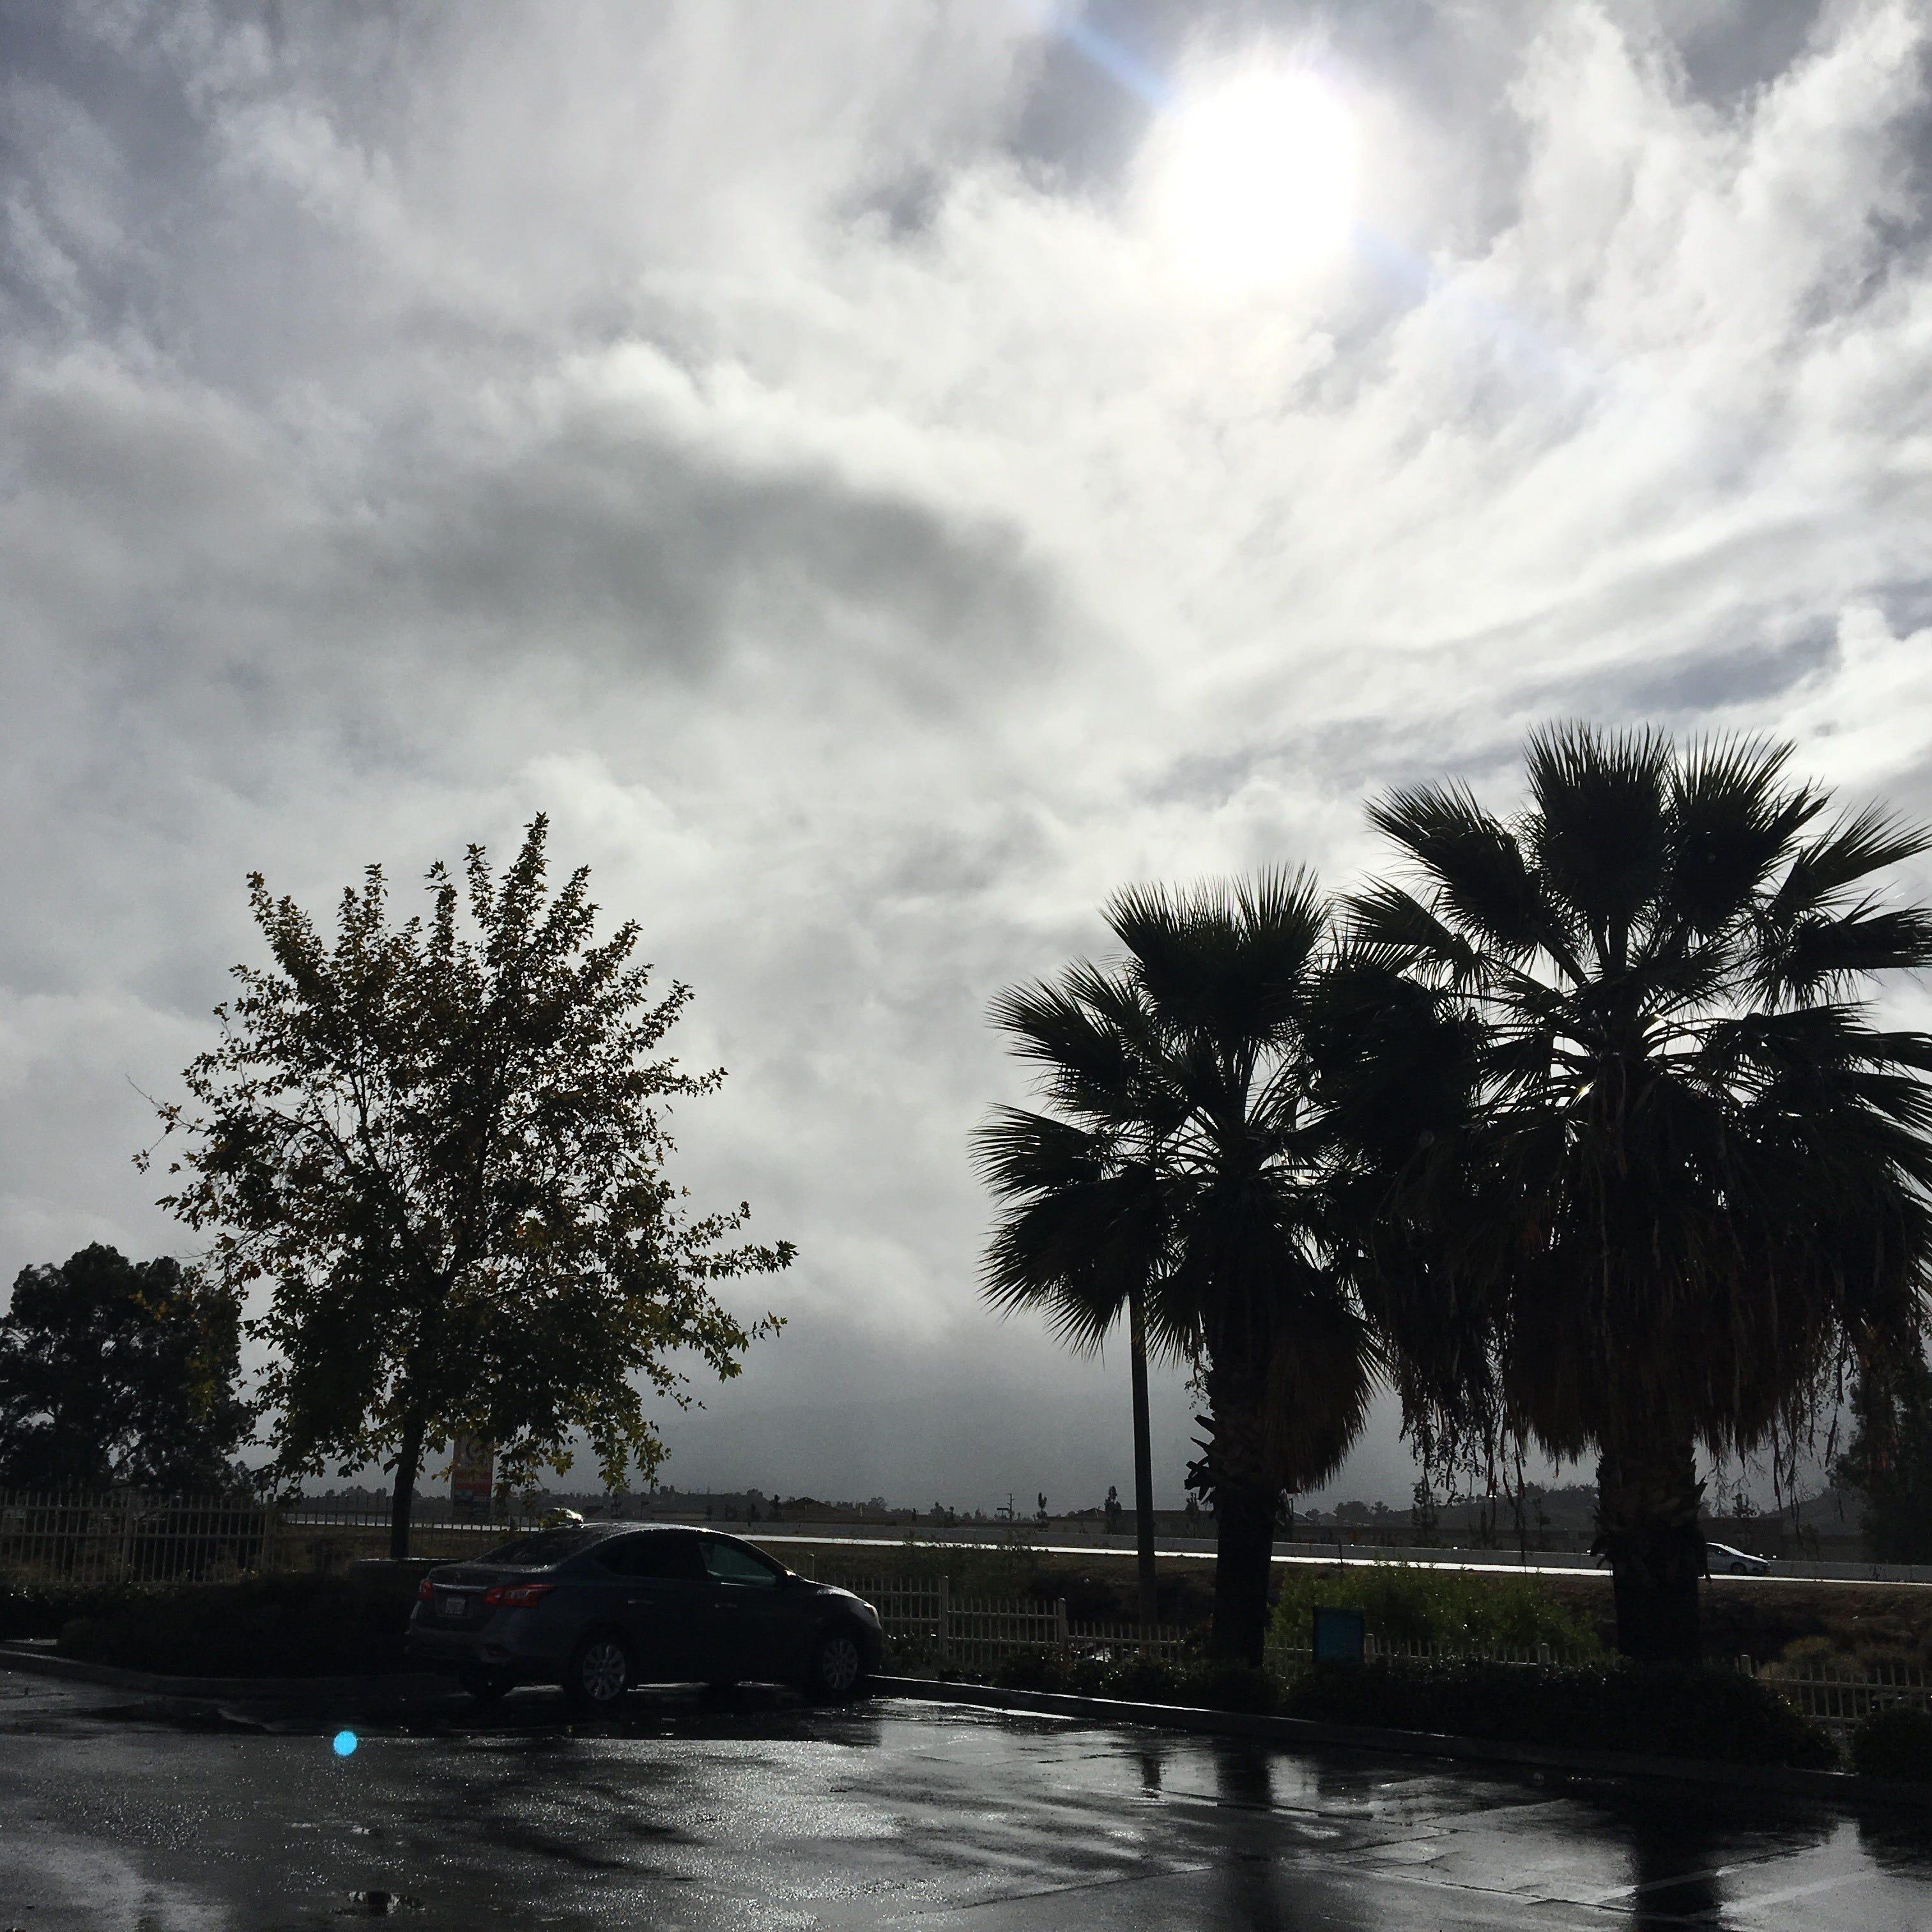 As mandatory evacuations remain near Holy Fire burn areas, flash flood warning expires